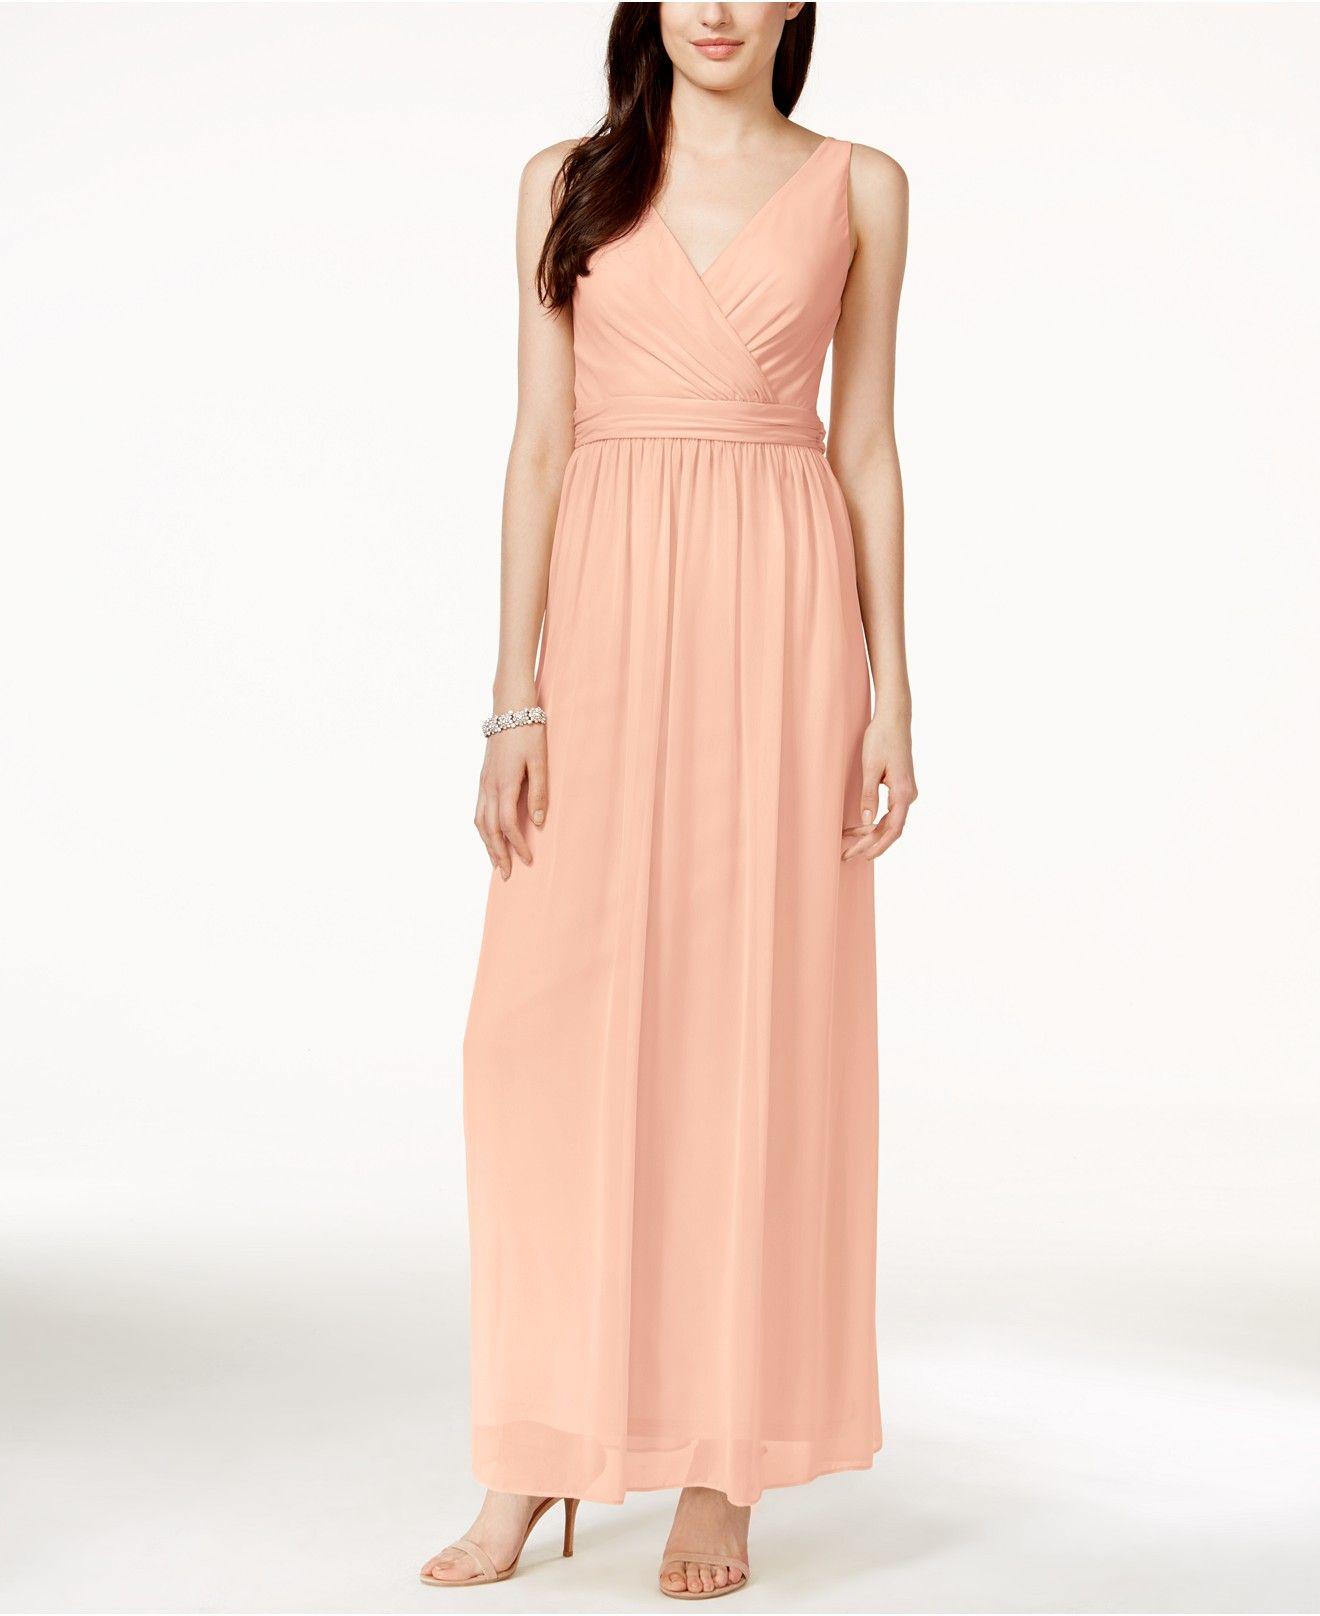 Adrianna By Adrianna Papell Chiffon Draped Sleeveless Gown - Shop ...